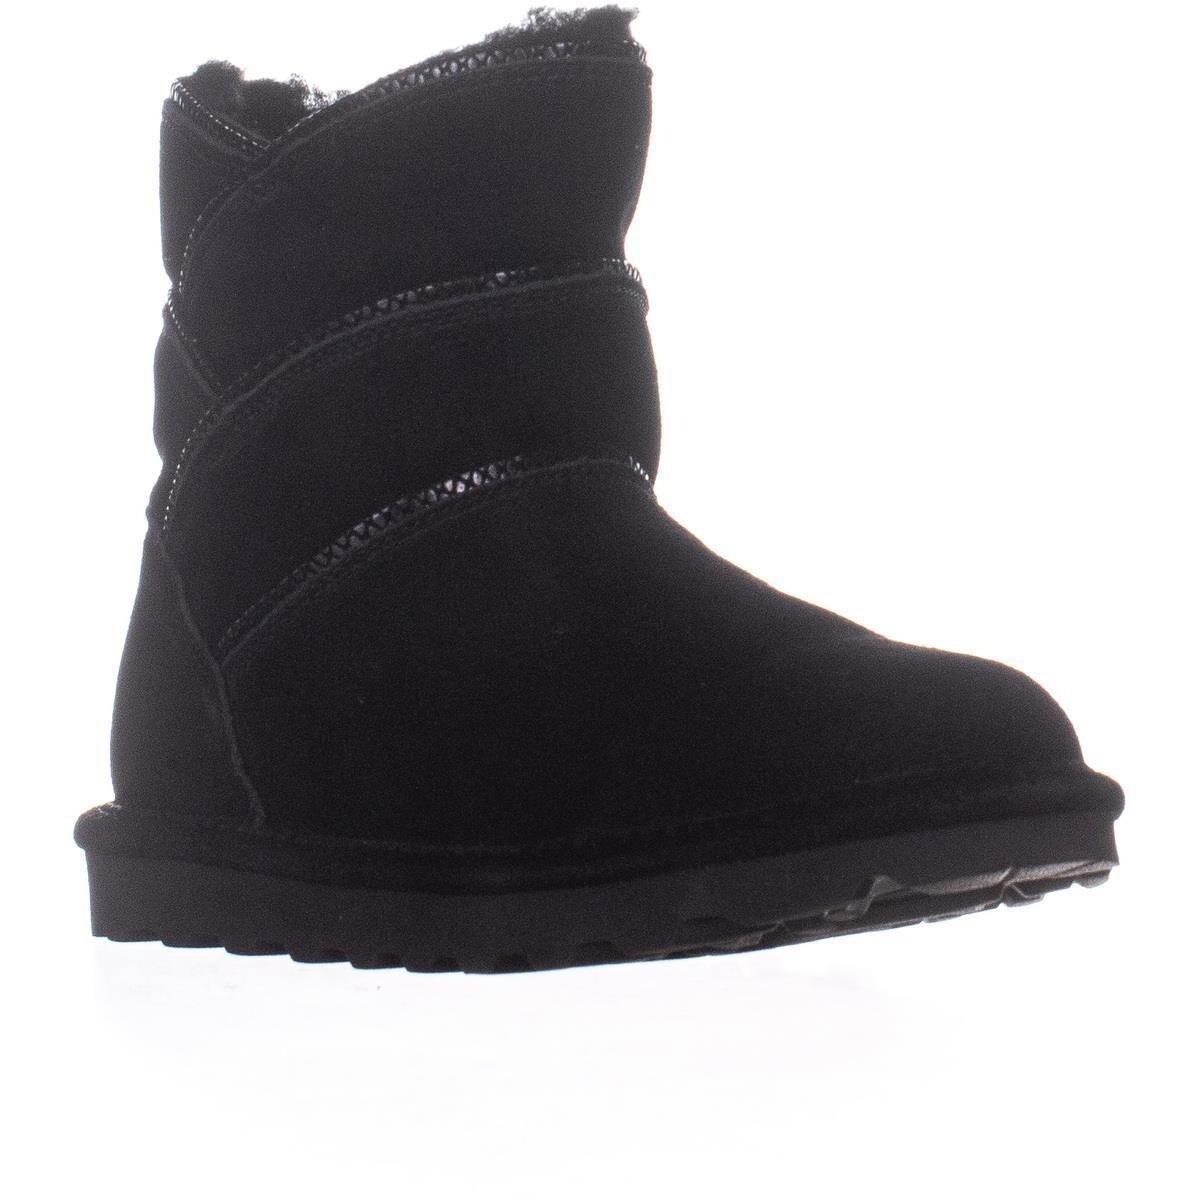 15a9ceb24b216 Shop Bearpaw Angela Flat Winter Boots, Black Suede - 7 US / 38 EU ...